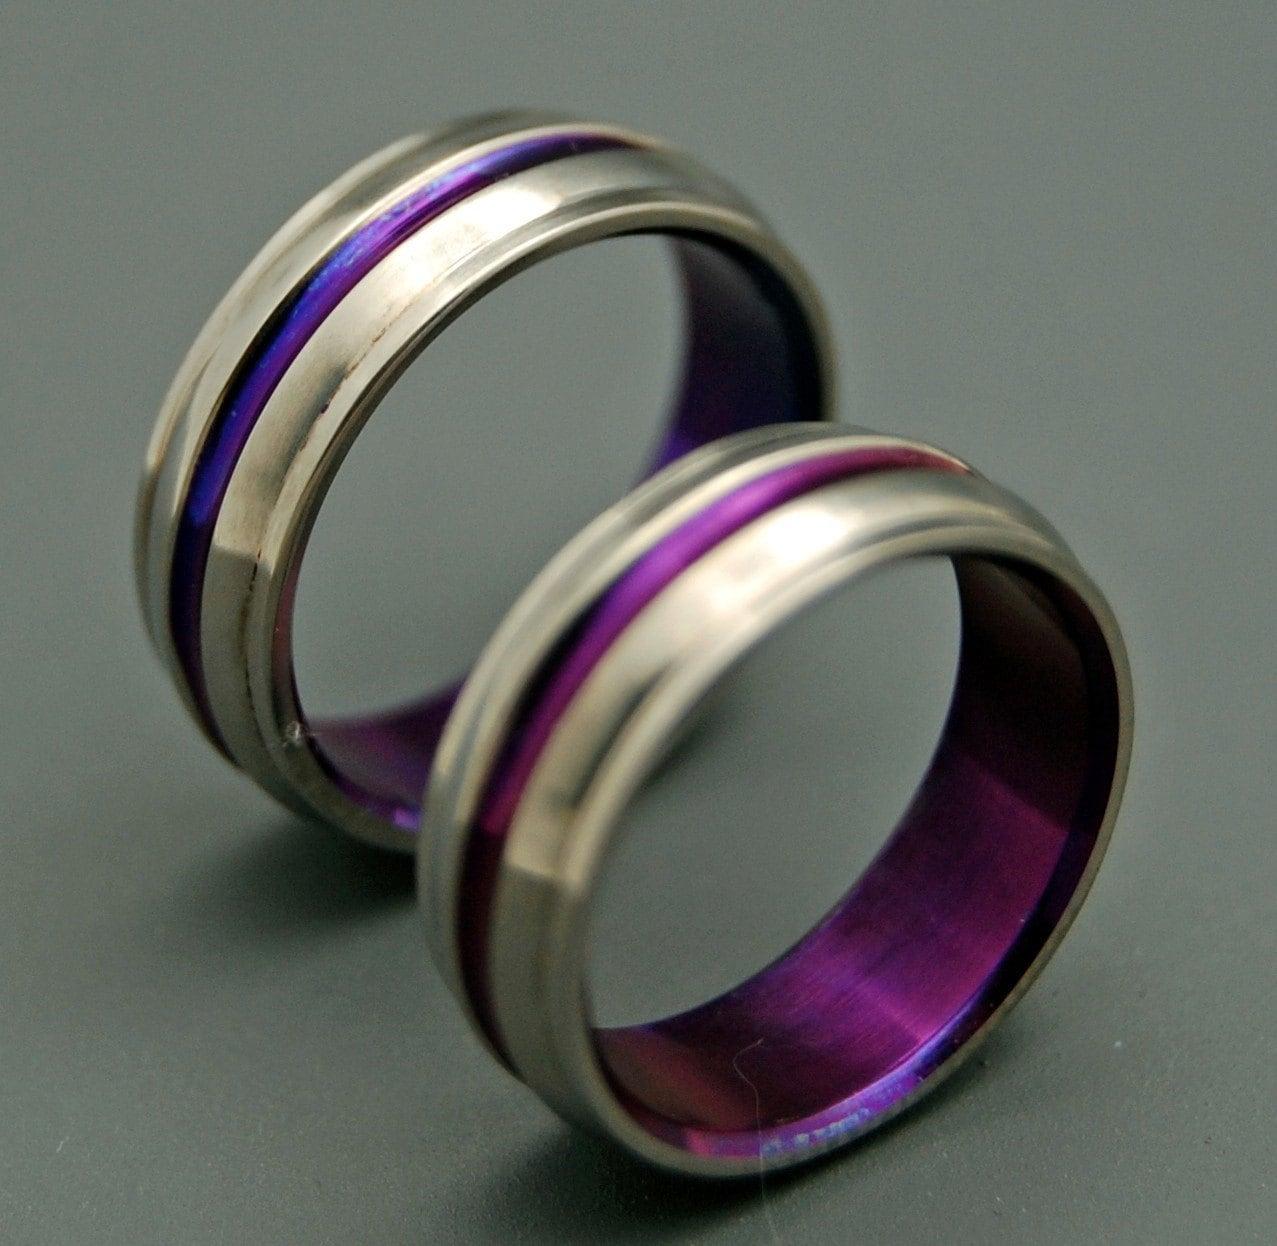 titanium wedding bands wedding rings purple wedding rings zoom